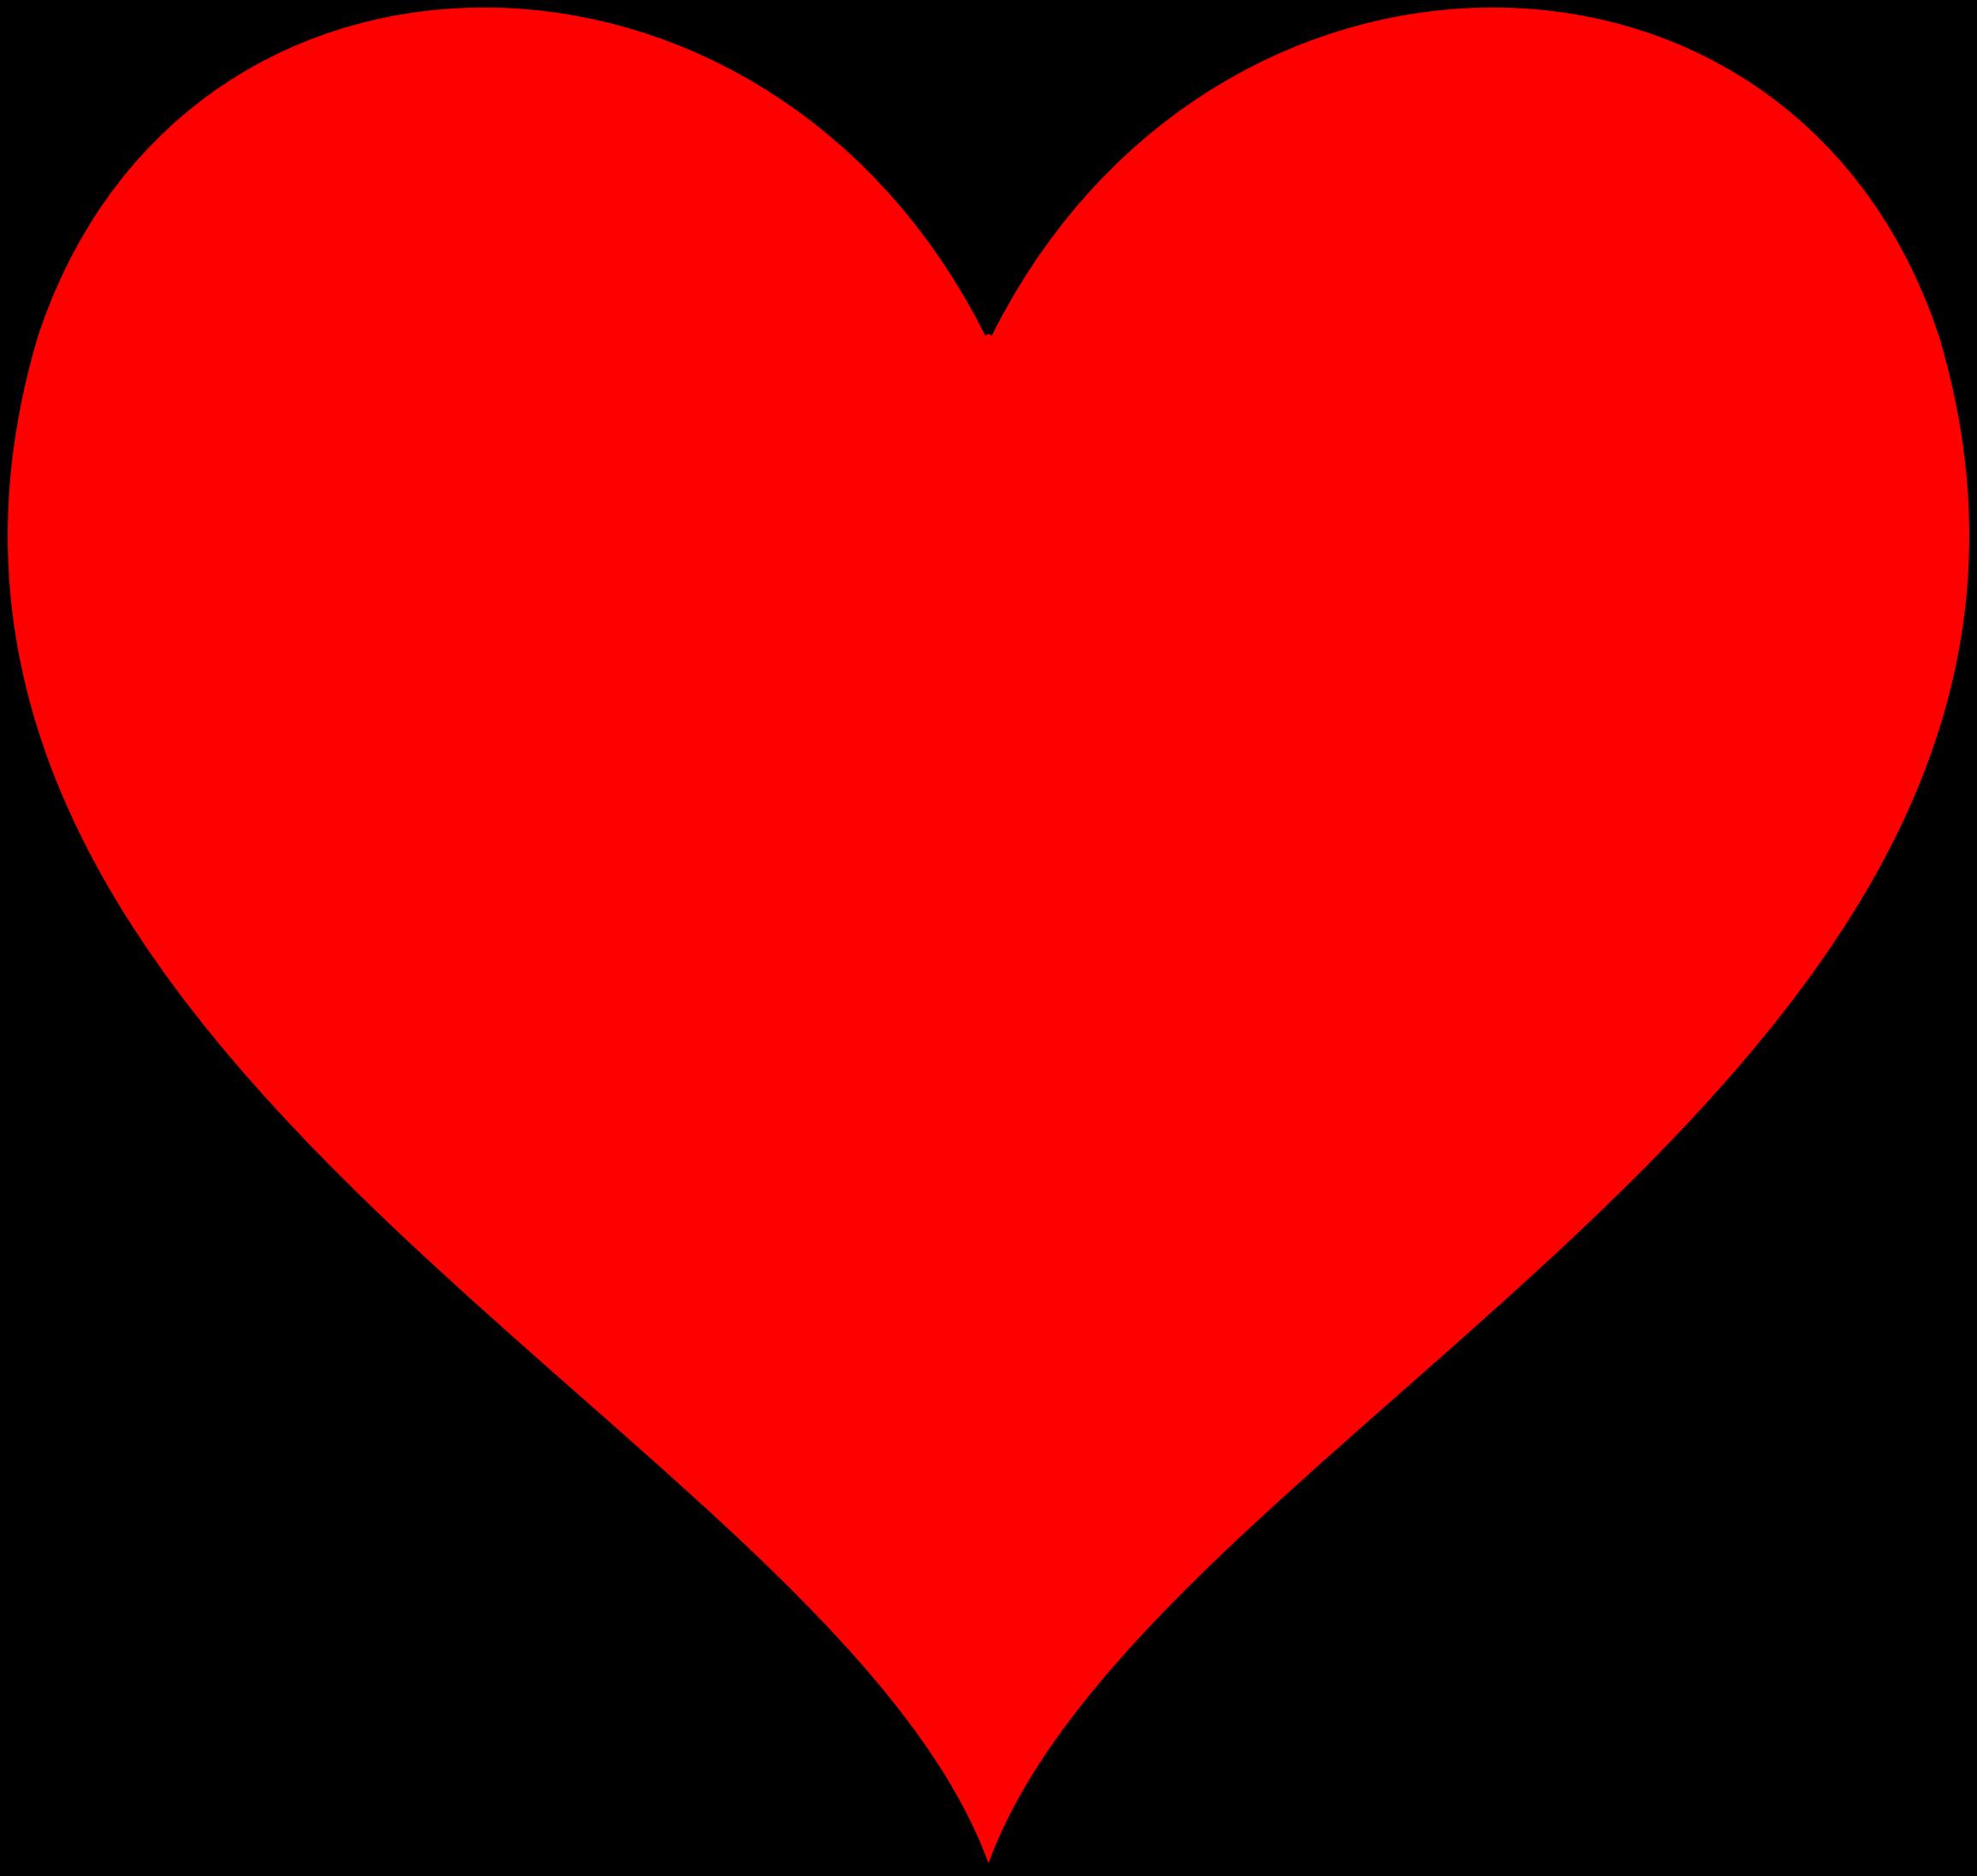 Hearts clipart love symbol Symbol Symbol Heart Heart Clipart